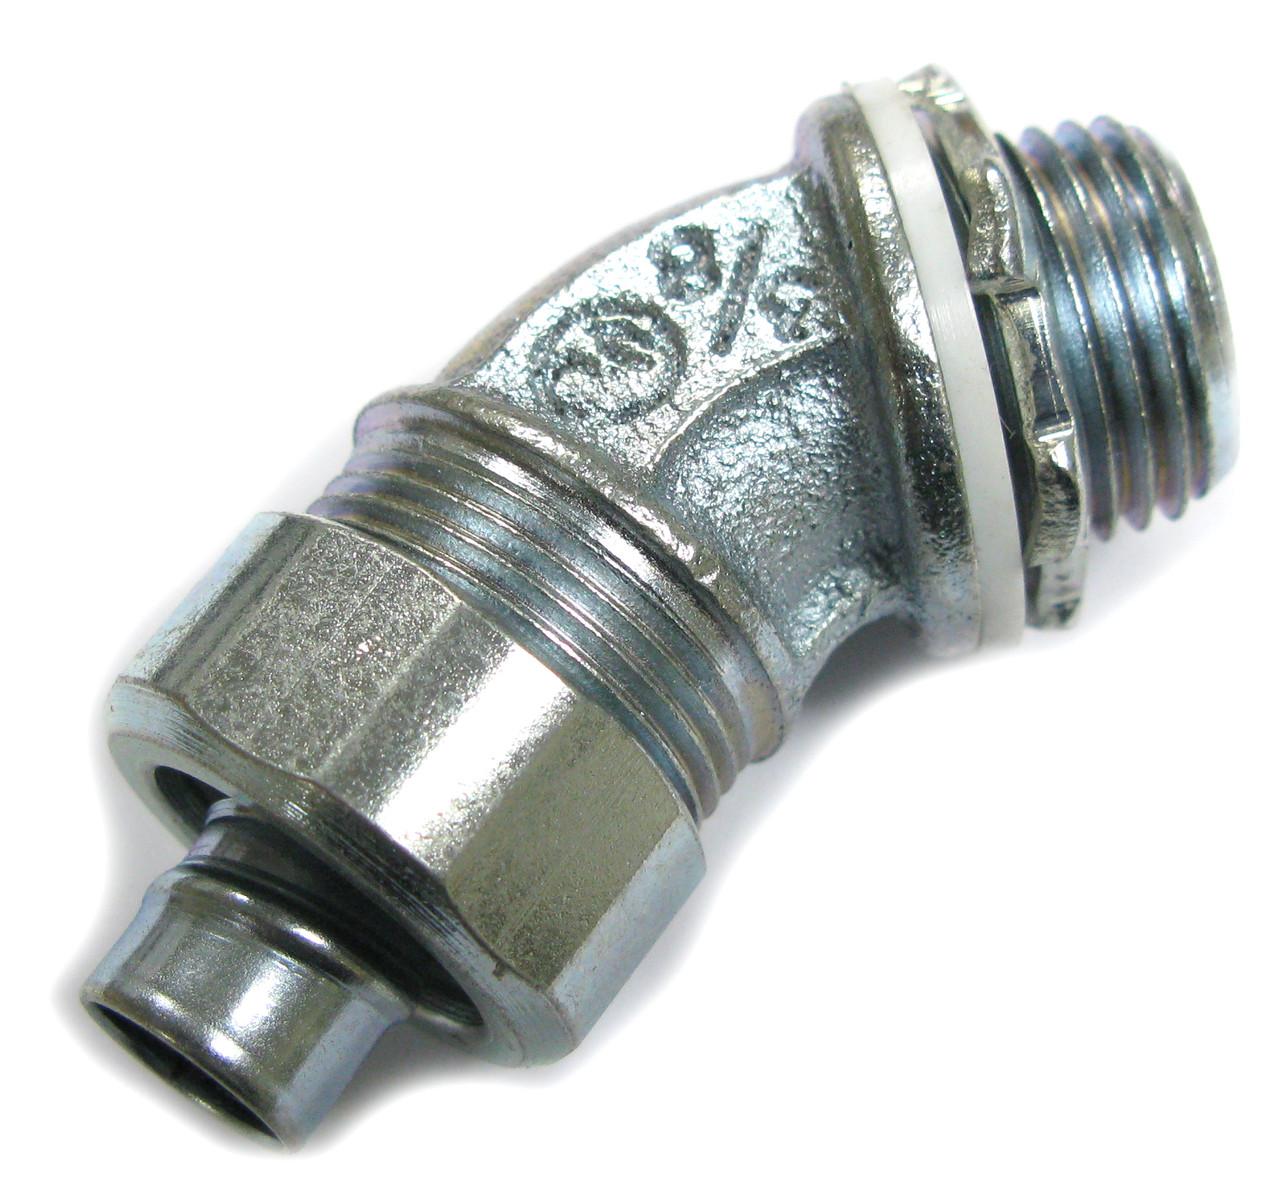 Amfi 45 Degree Elbow Sealtite Liquidtight Fitting, 3/8 Inch USA